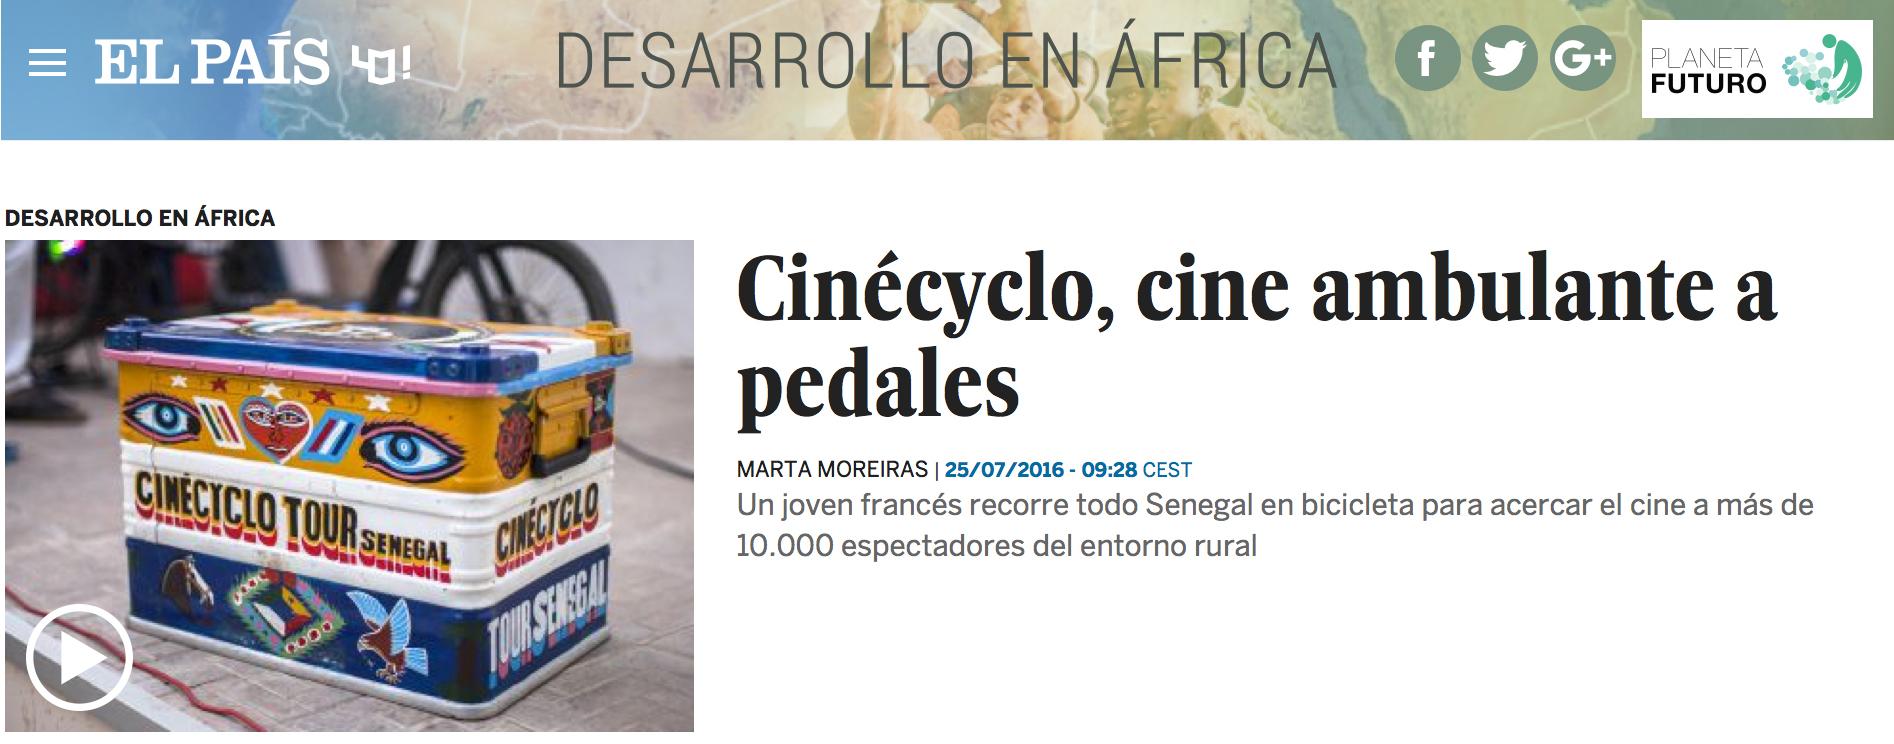 Cinecyclo_Planeta Futuro_Reportaje_02